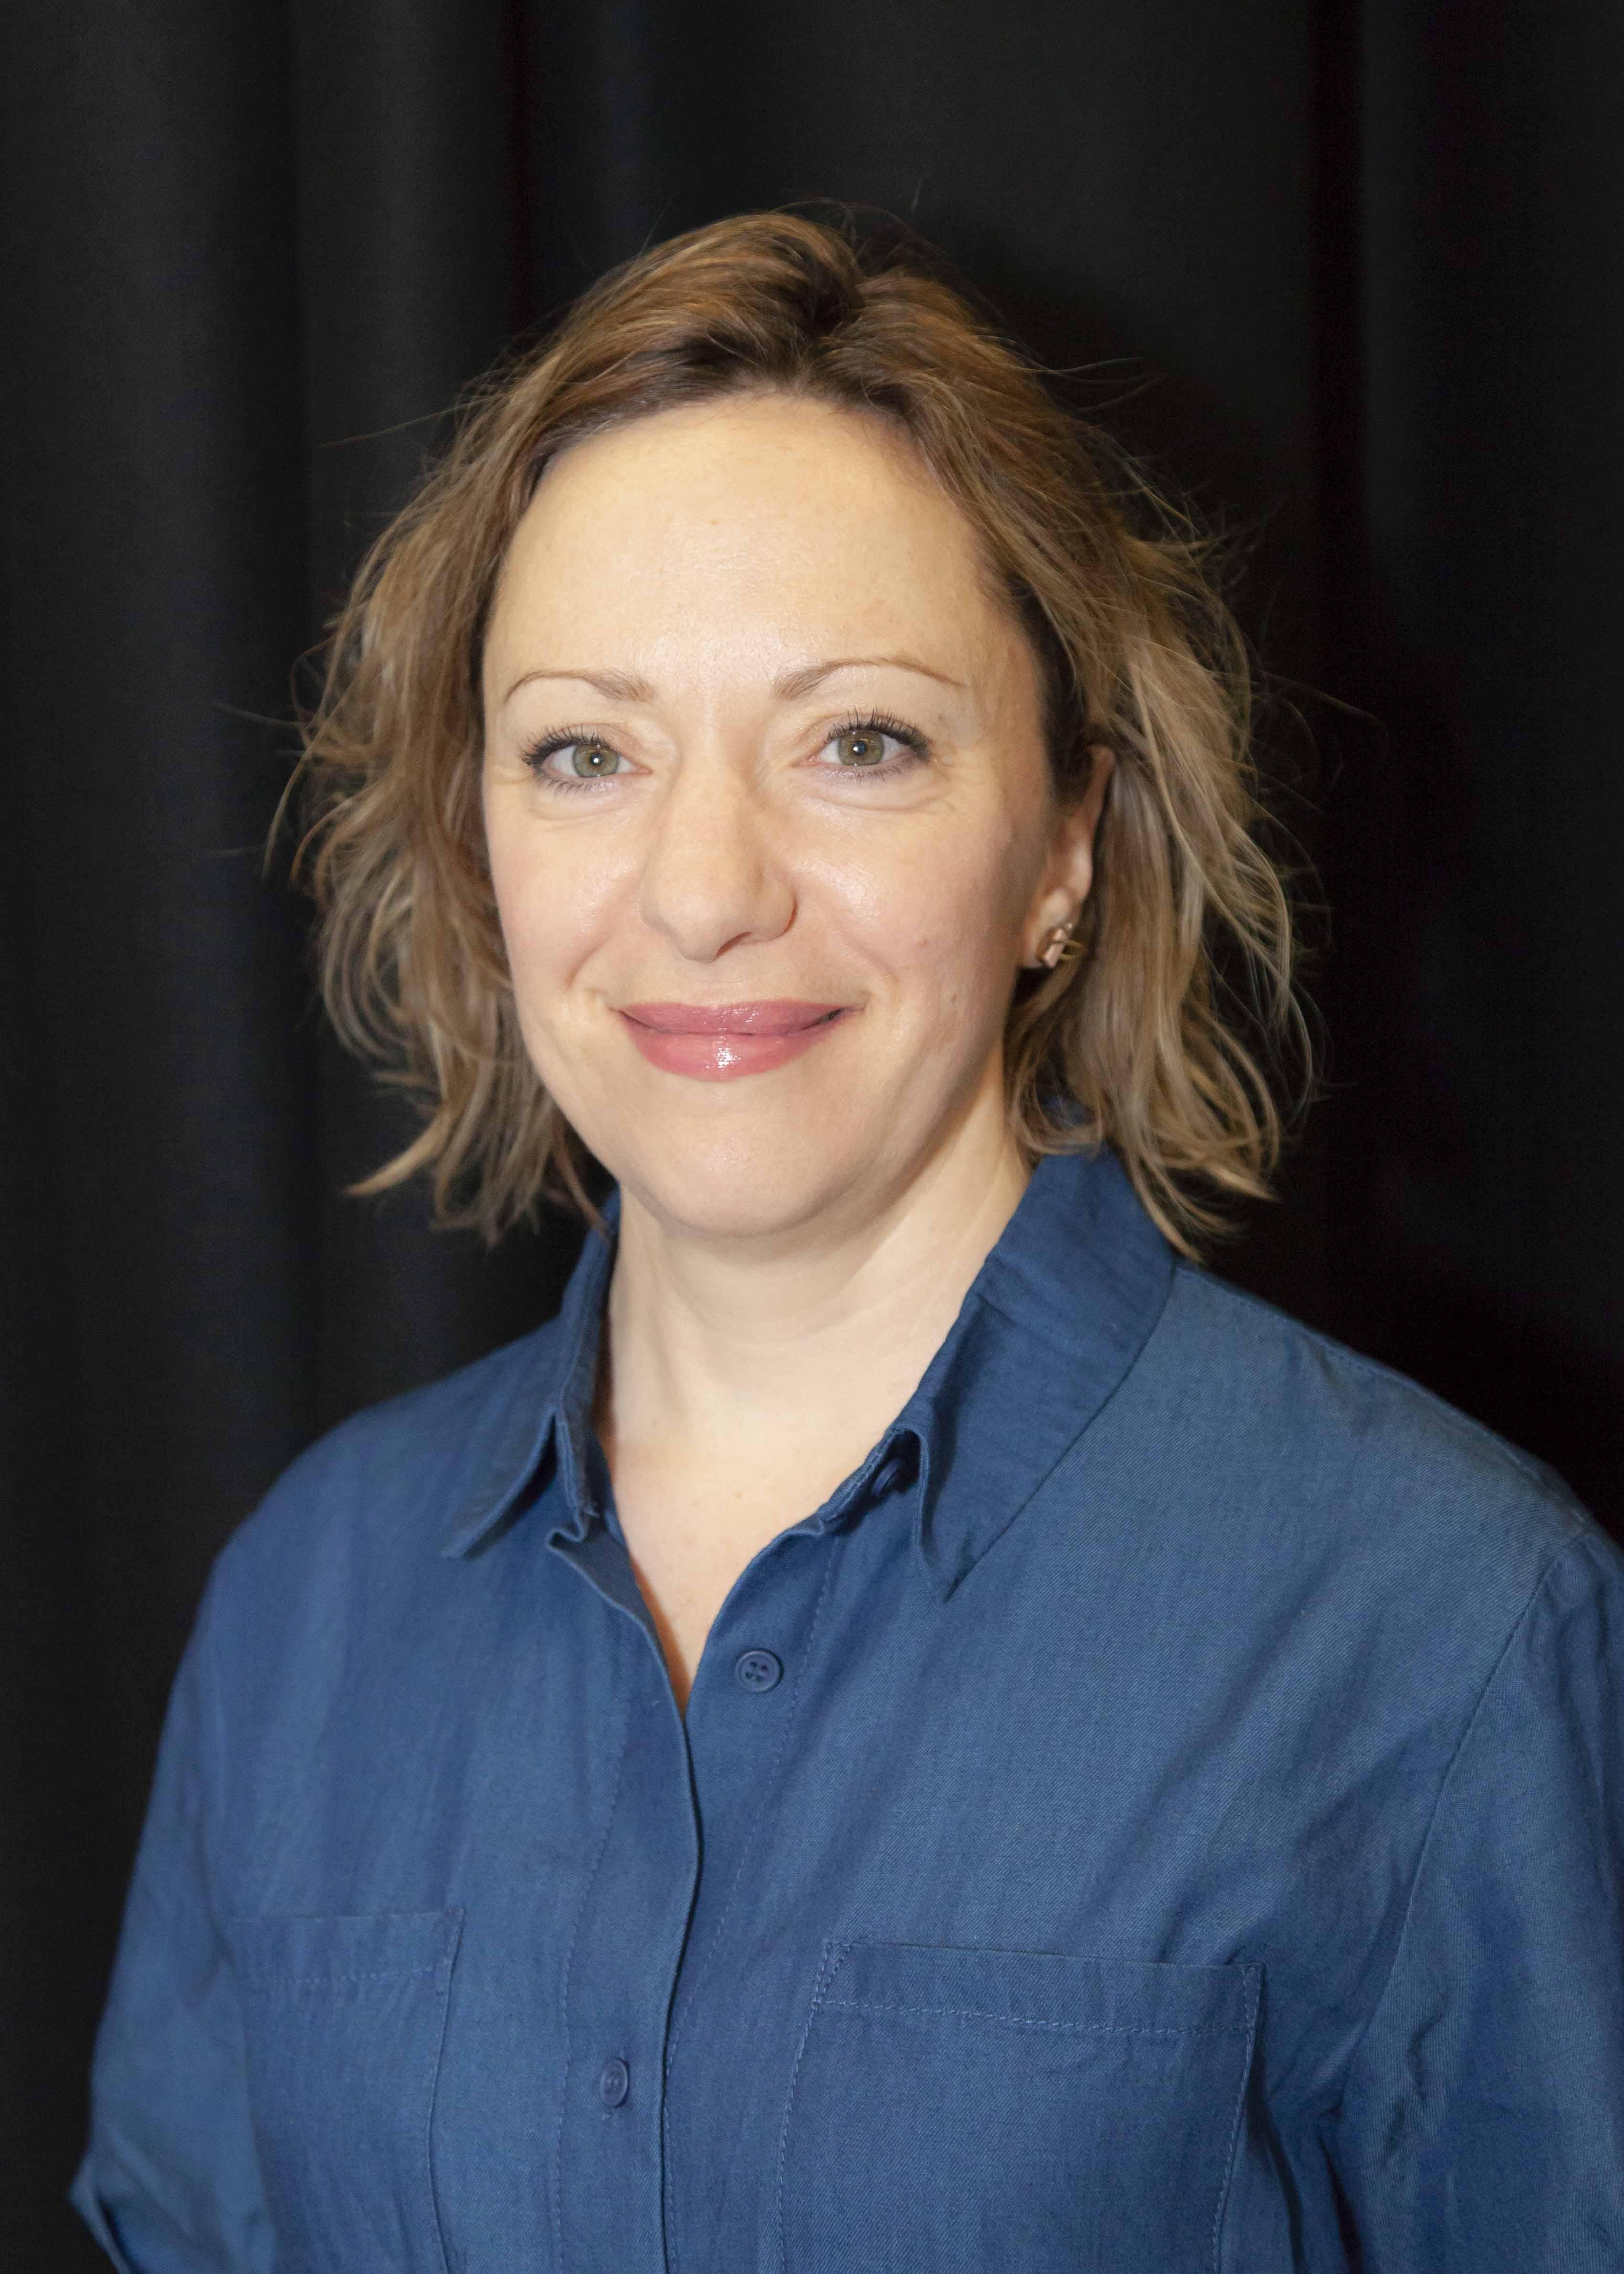 Anne Fry, VONNE'S Deputy Chief Executive